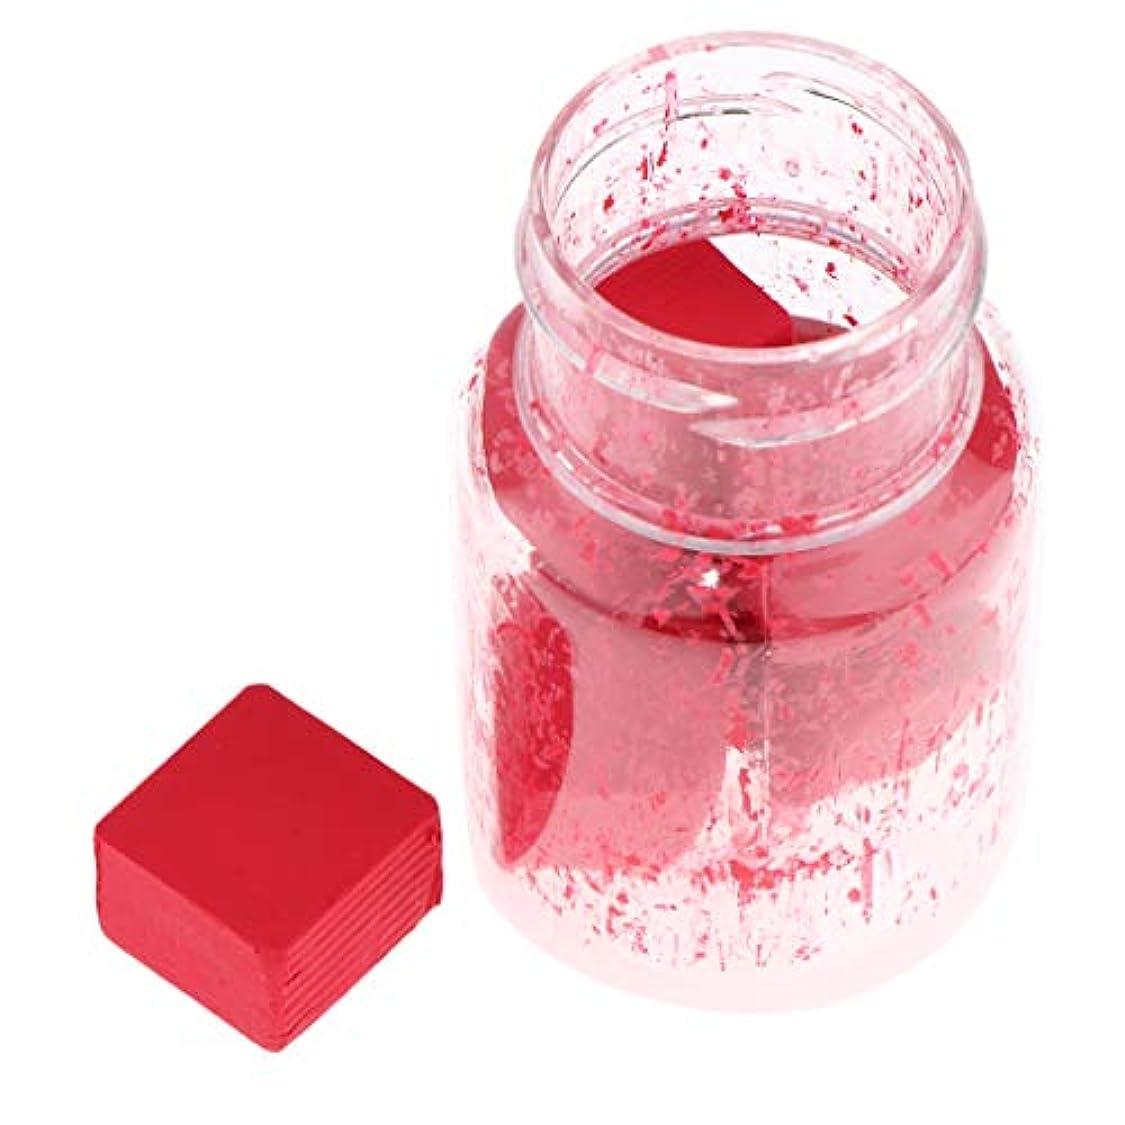 T TOOYFUL DIY 口紅作り リップスティック材料 リップライナー顔料 2g DIY化粧品 9色選択でき - B